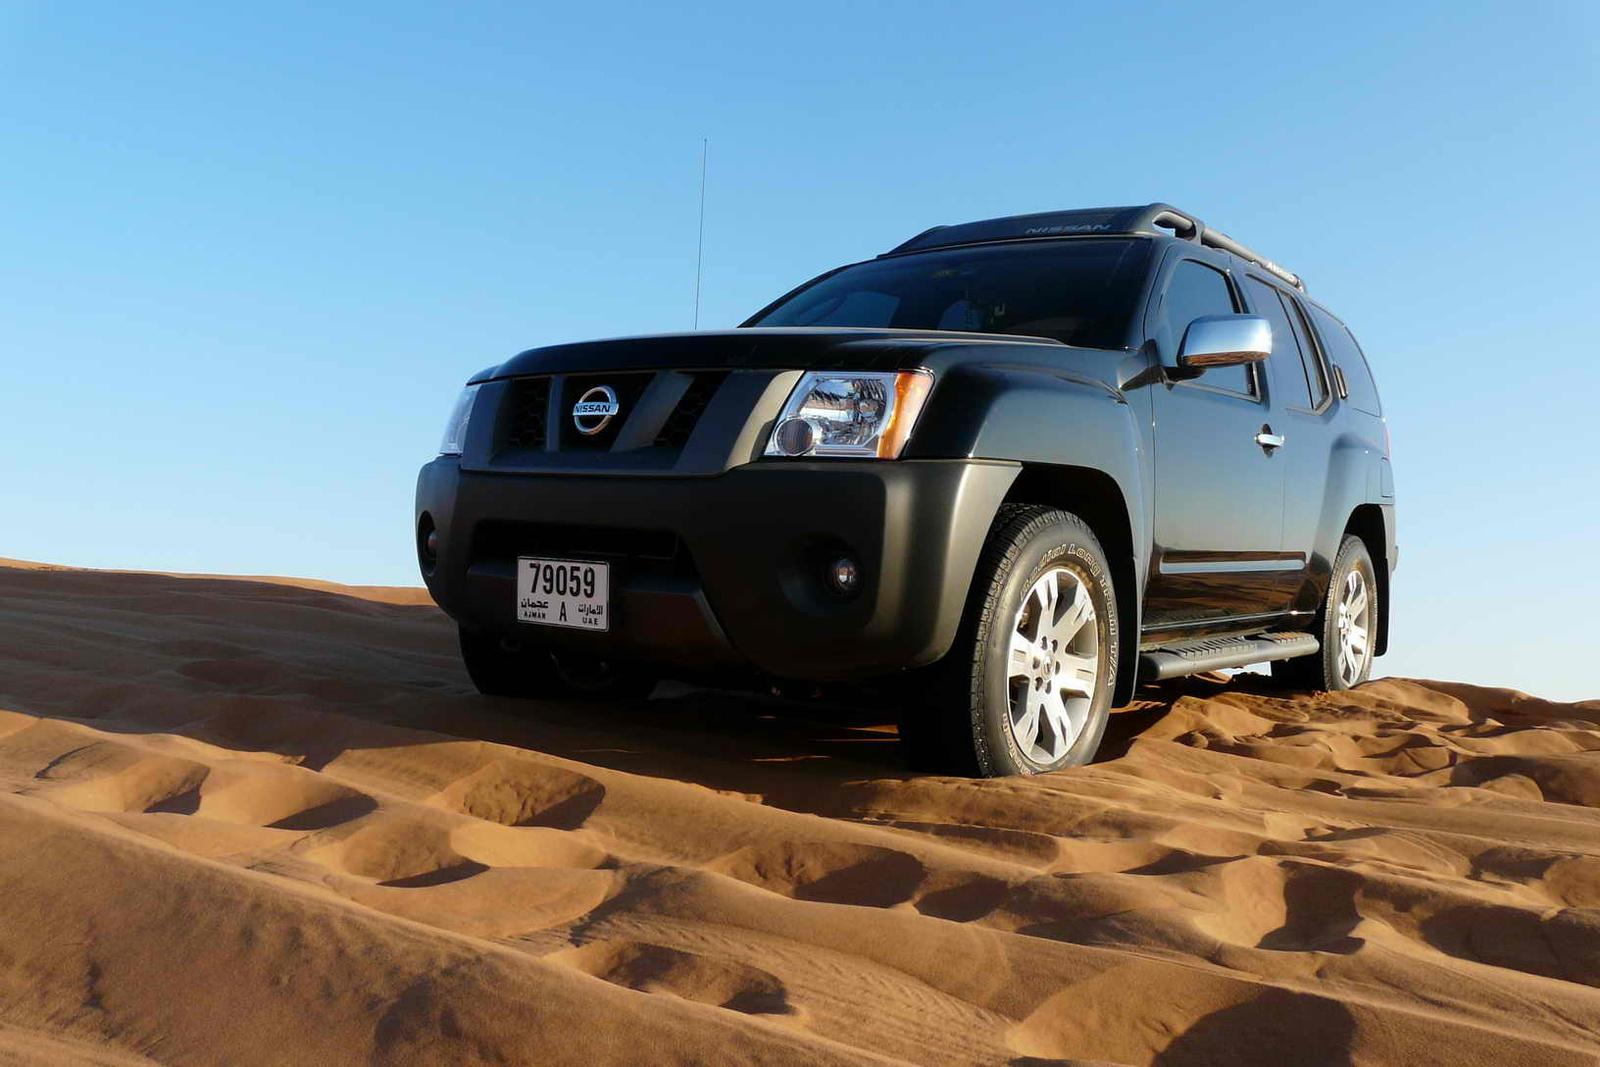 2008 Nissan Xterra Pictures Cargurus